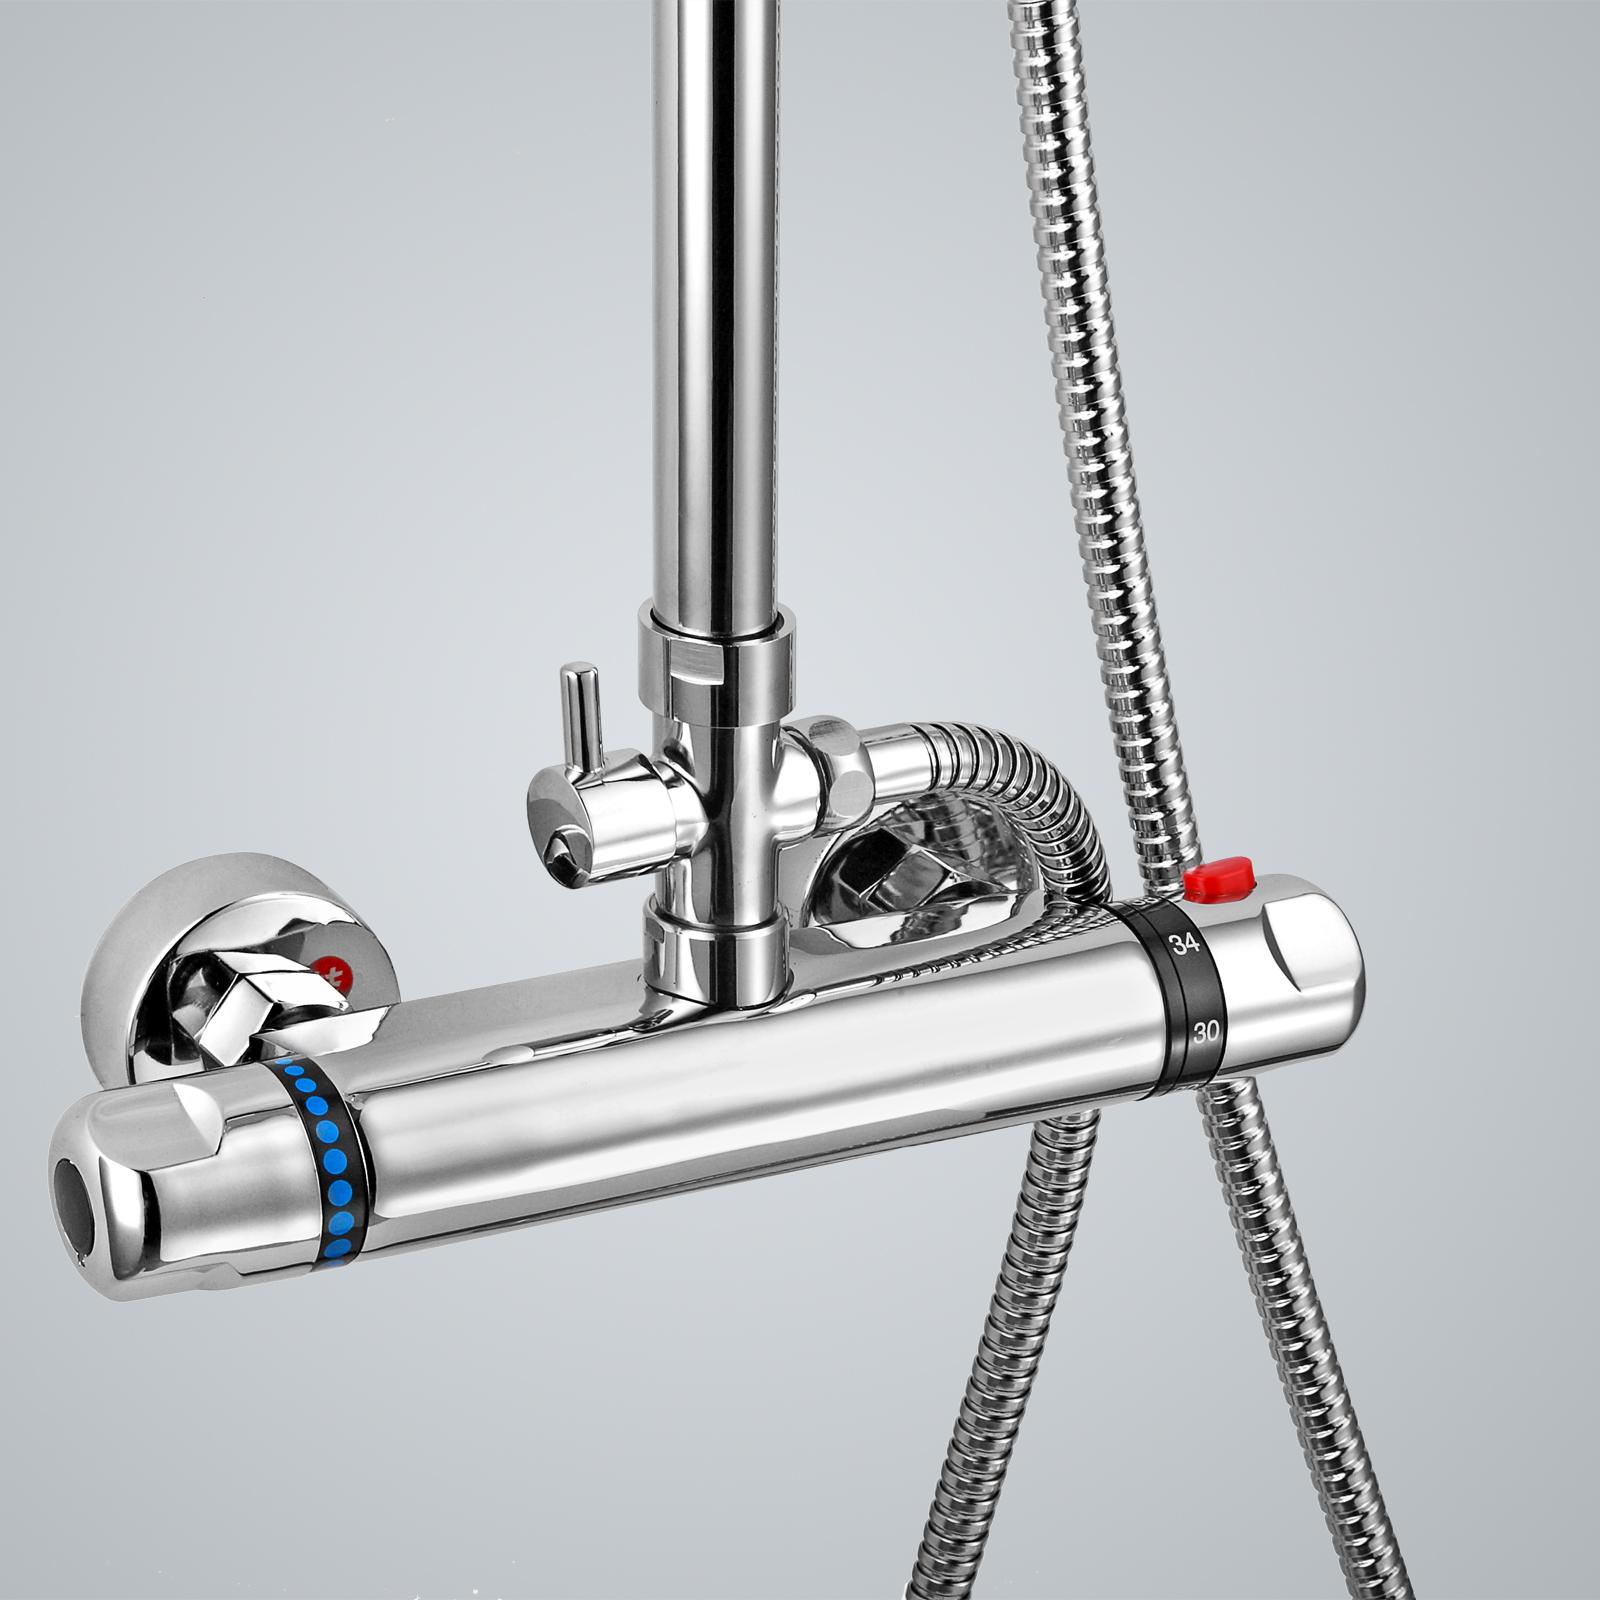 bathroom chrome thermostatic shower mixer bar valve tap riser kit twin. Black Bedroom Furniture Sets. Home Design Ideas